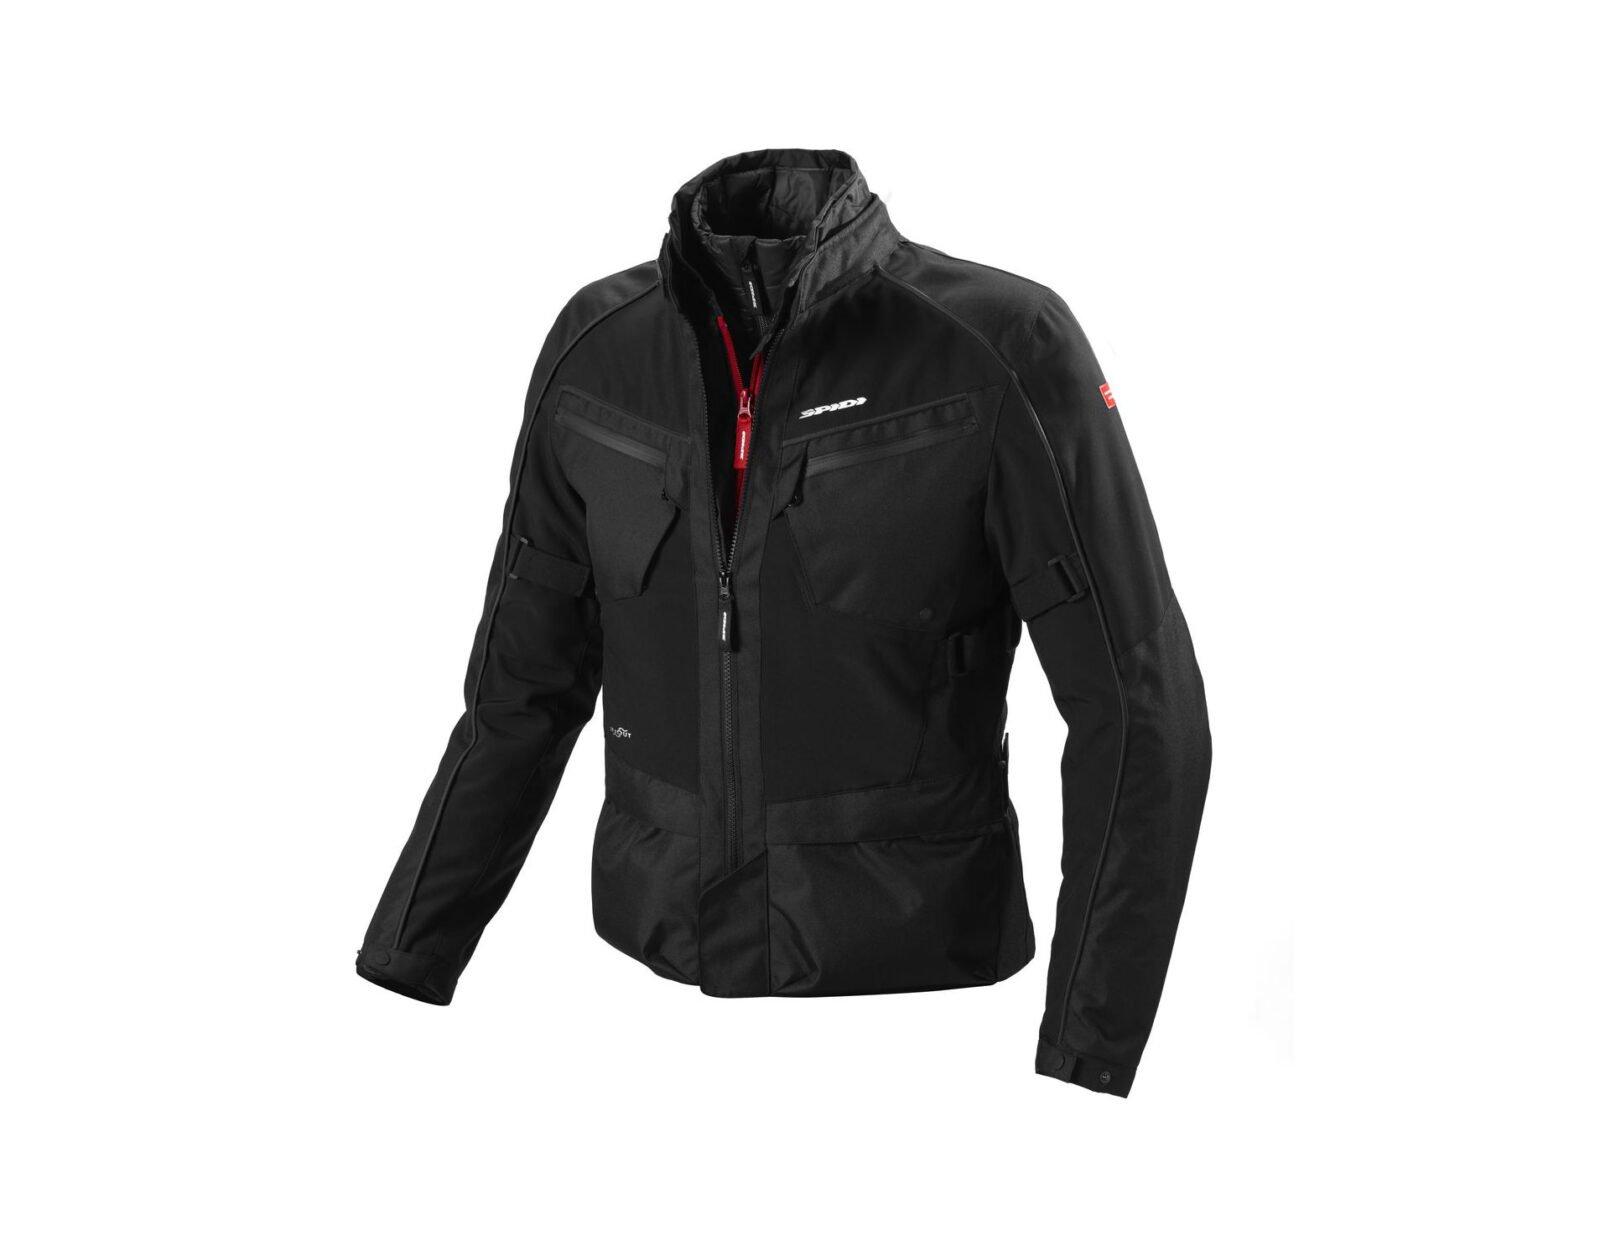 Spidi Intercruiser H2Out Jacket 1600x1251 - Spidi Intercruiser H2Out Jacket